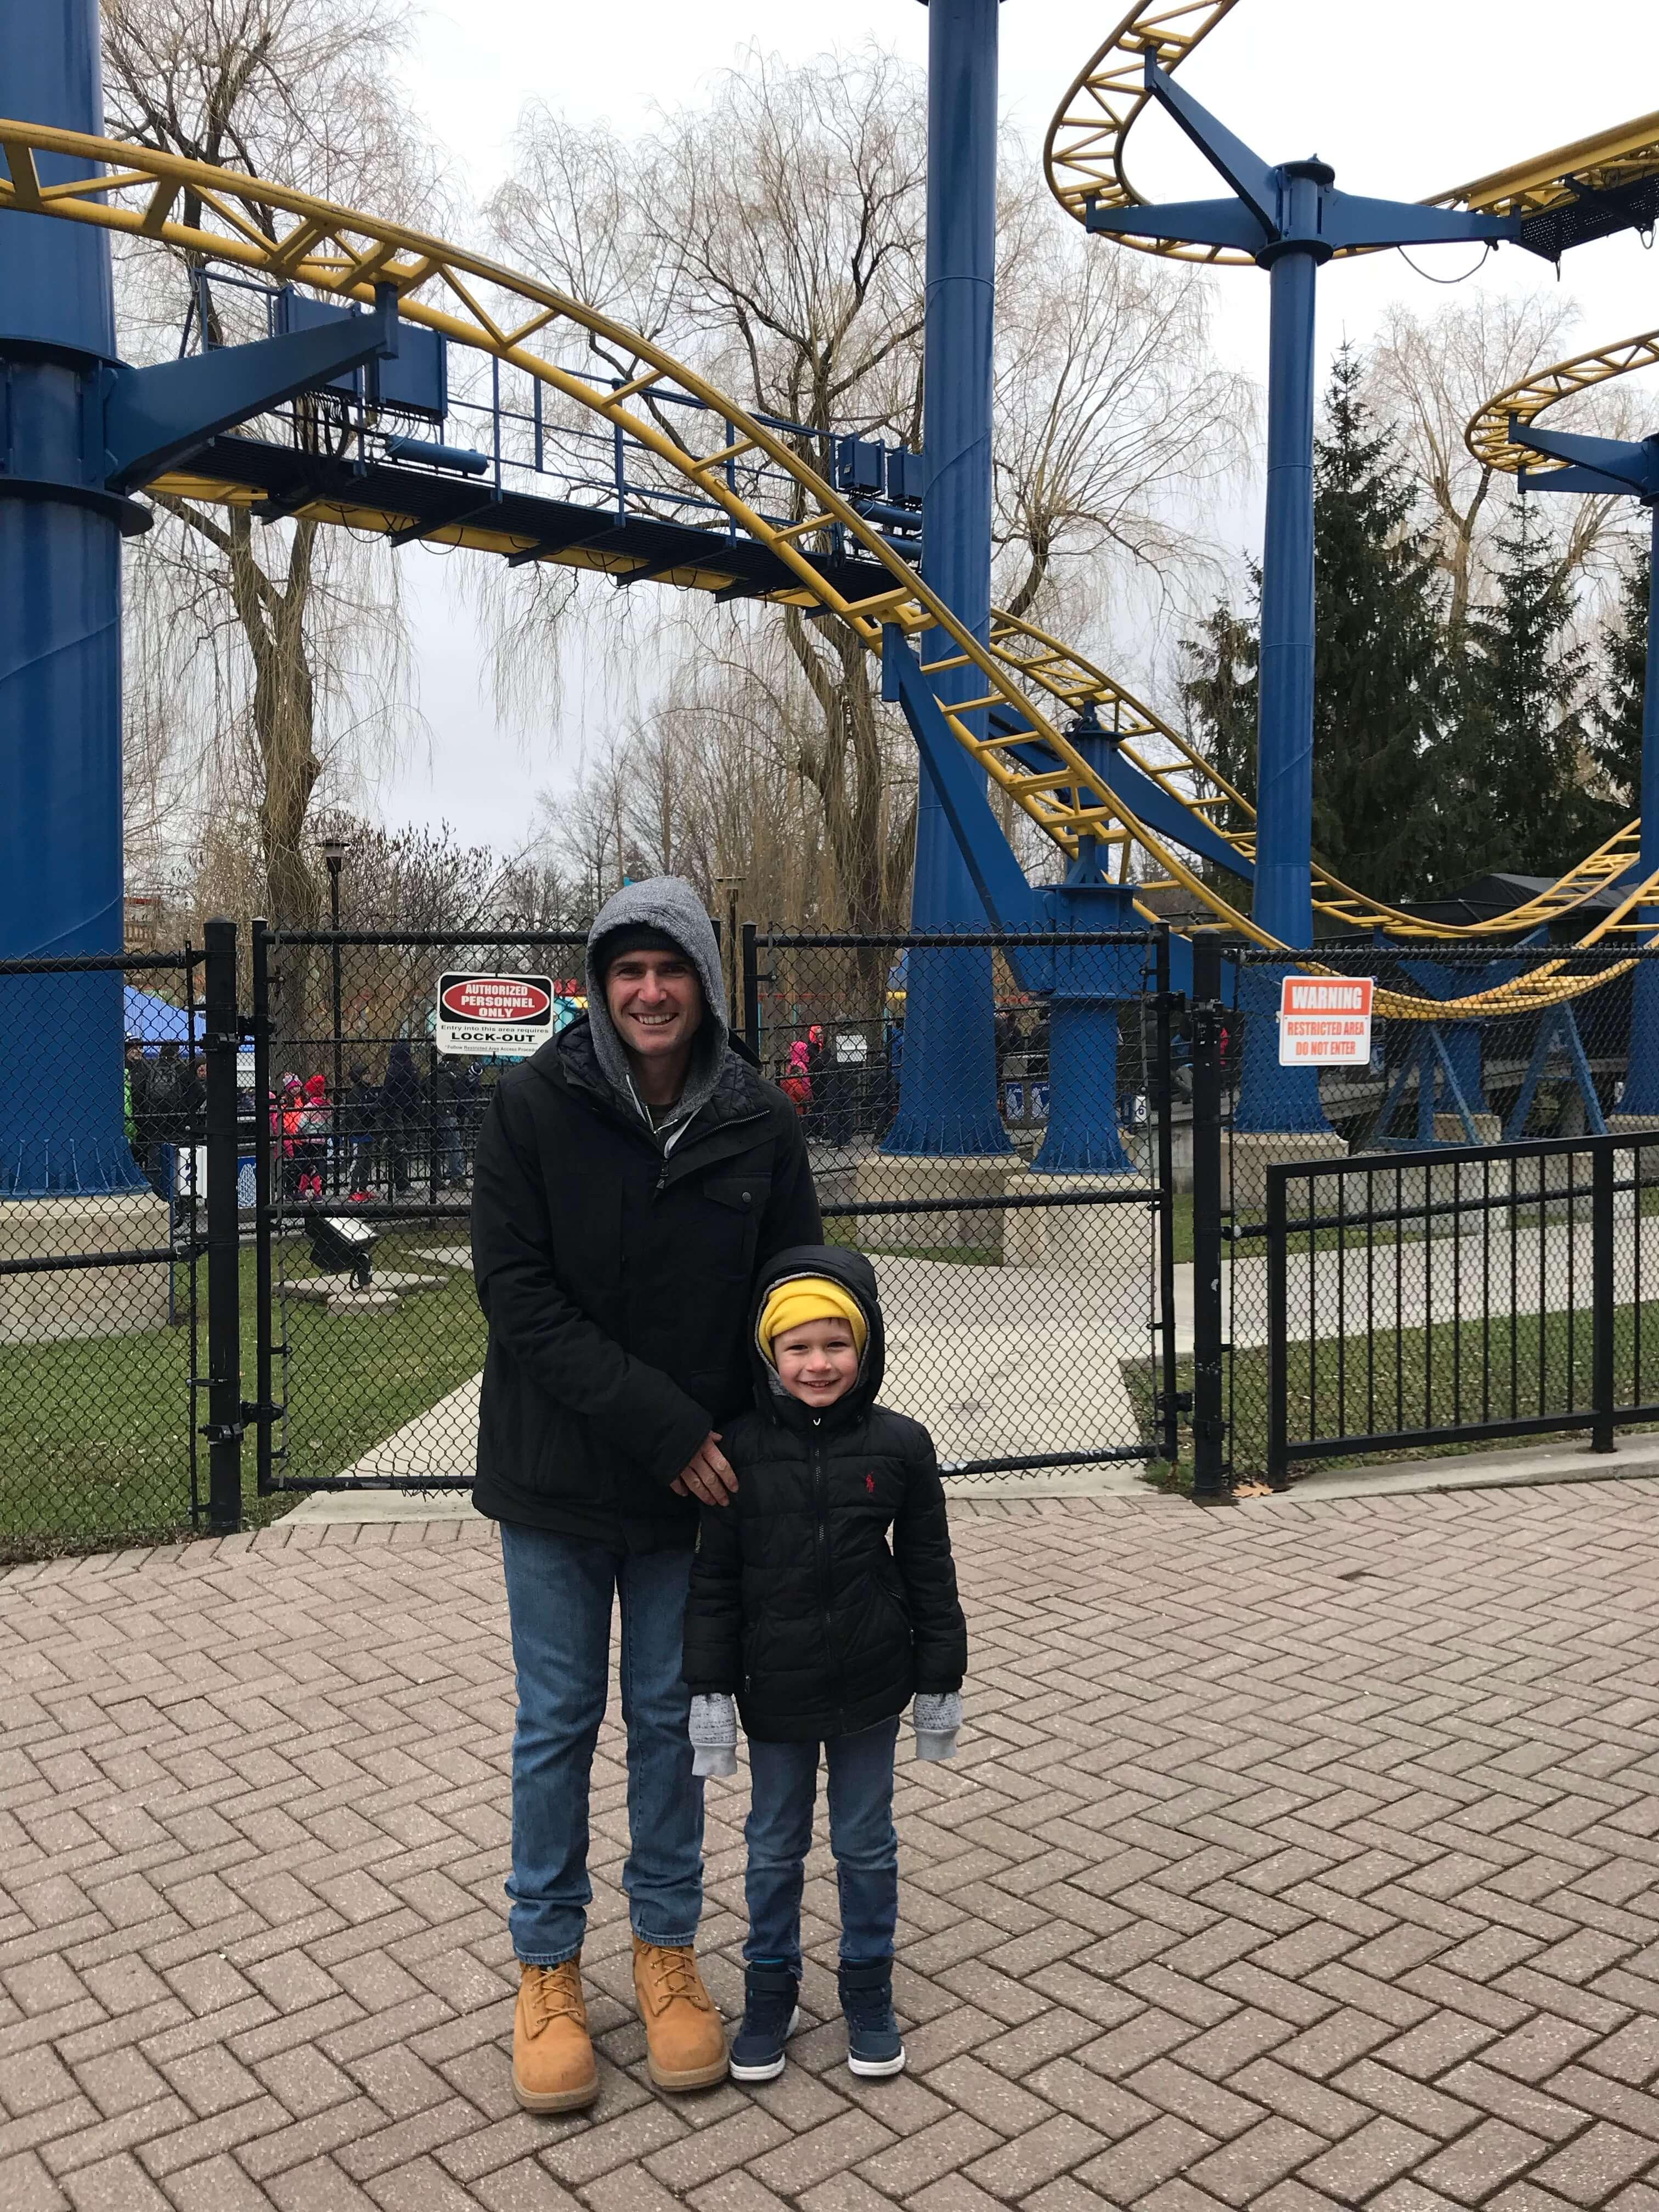 #wonderblogger; Canada's Wonderland 2018 new rides